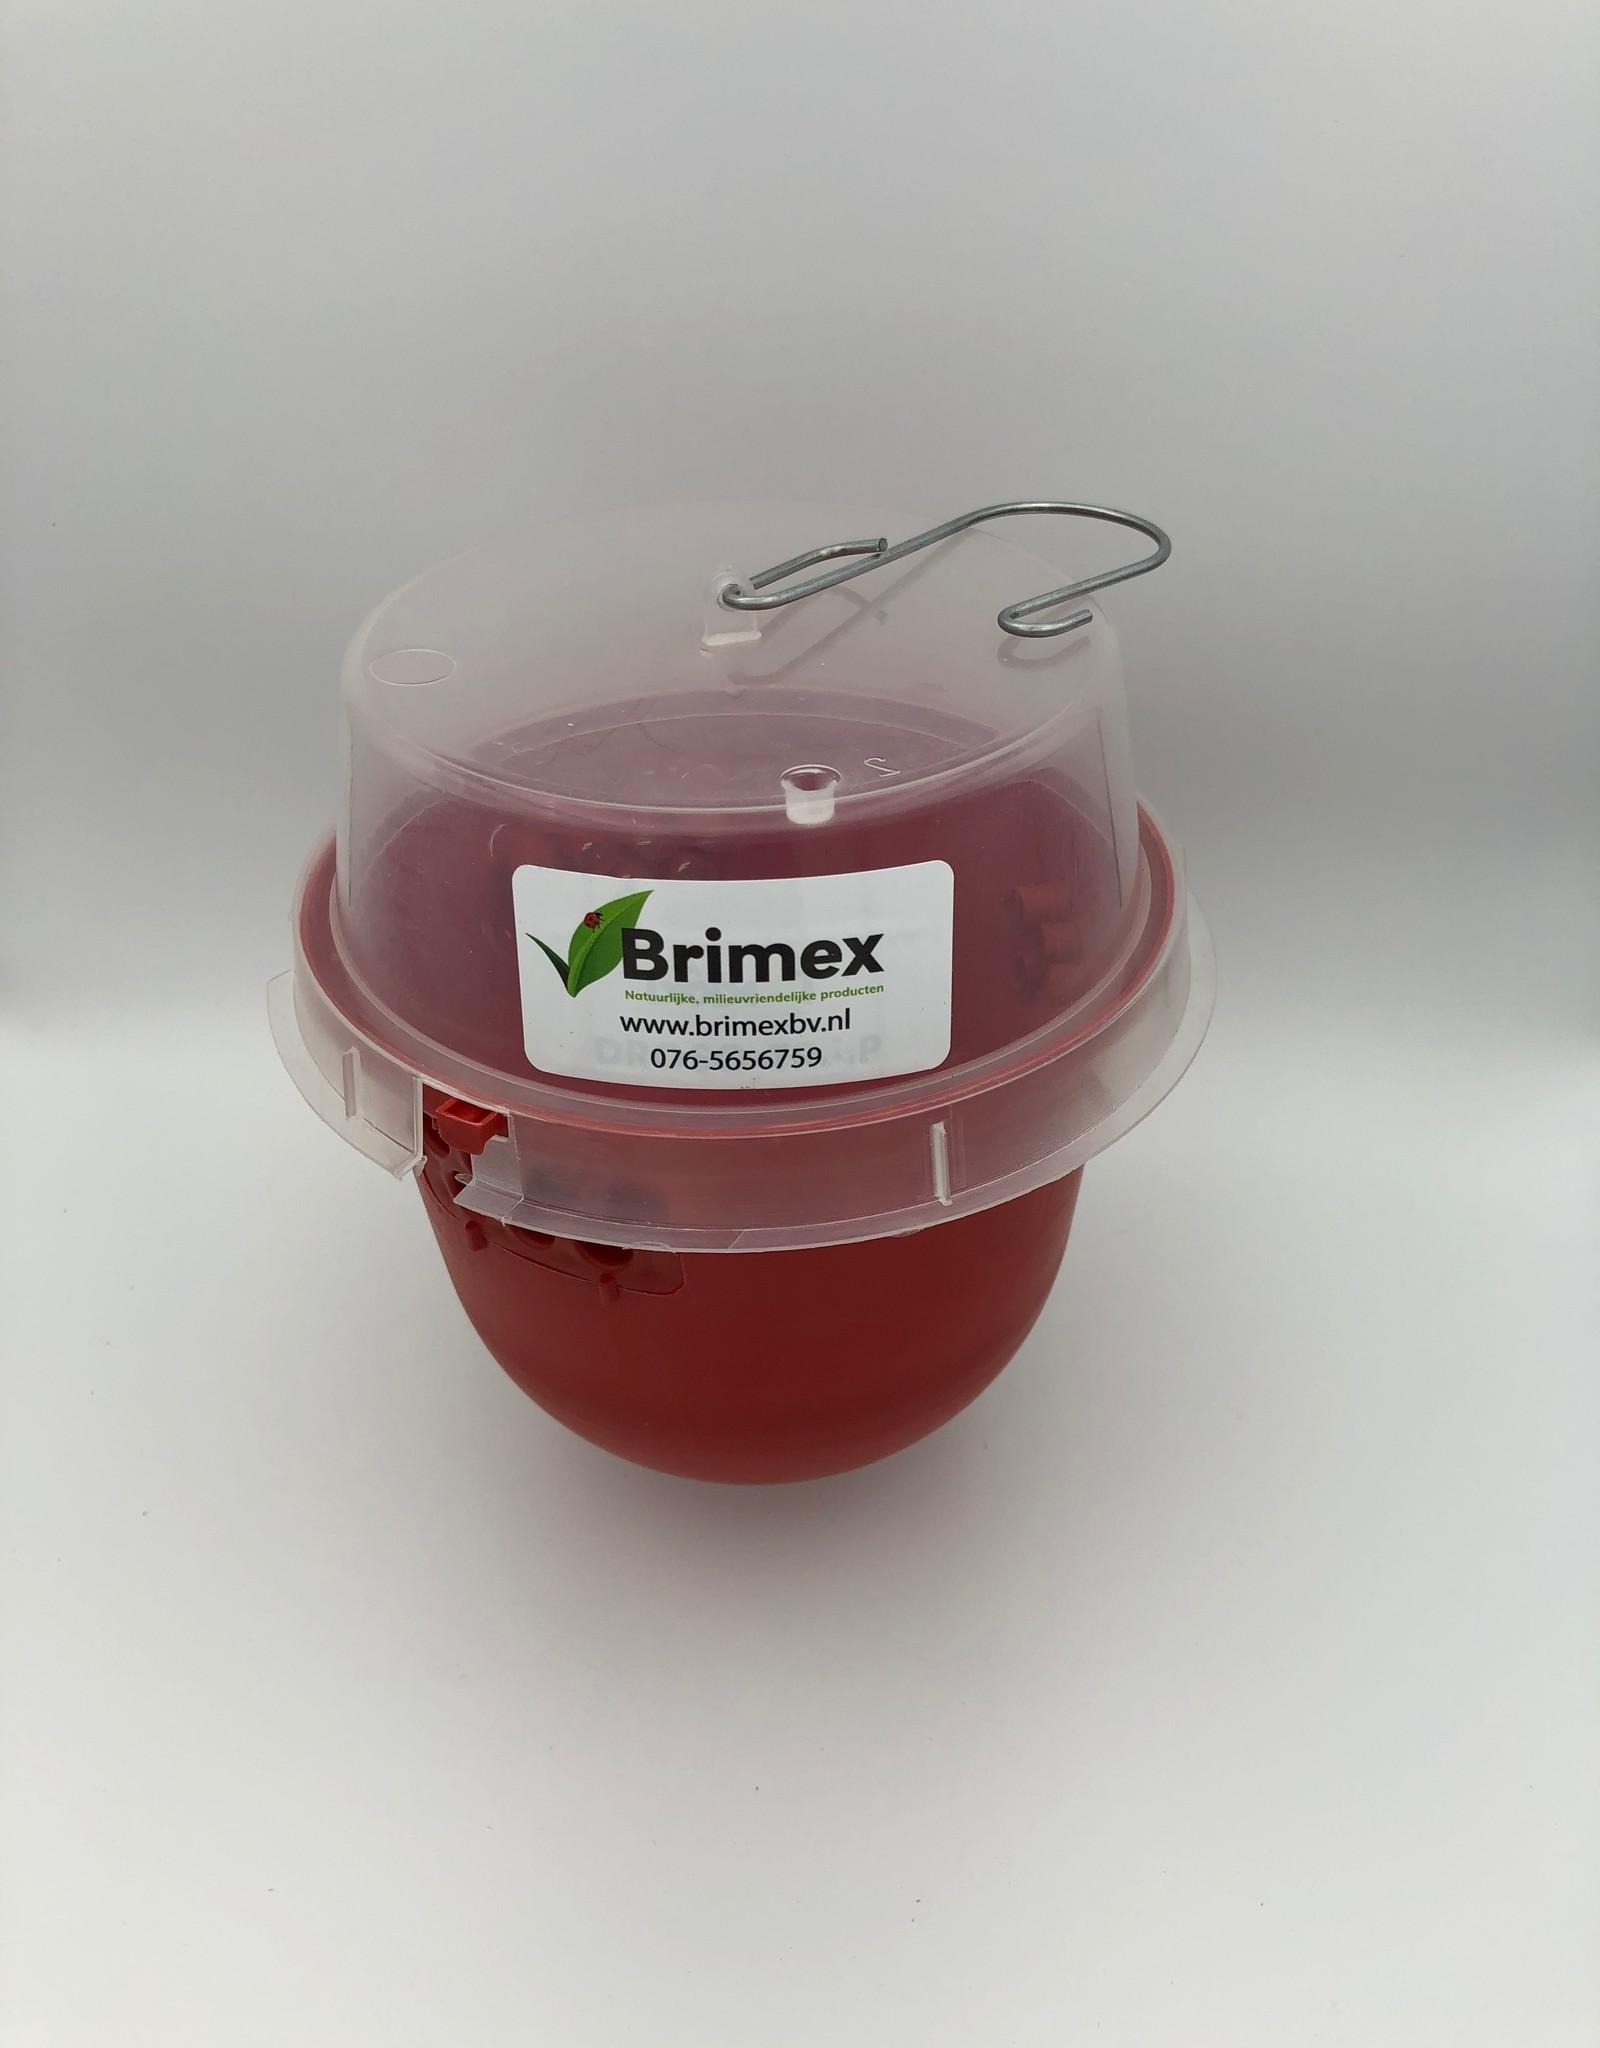 Brimex Biobest Bestrijding fruitvlieg met val Droso Trap